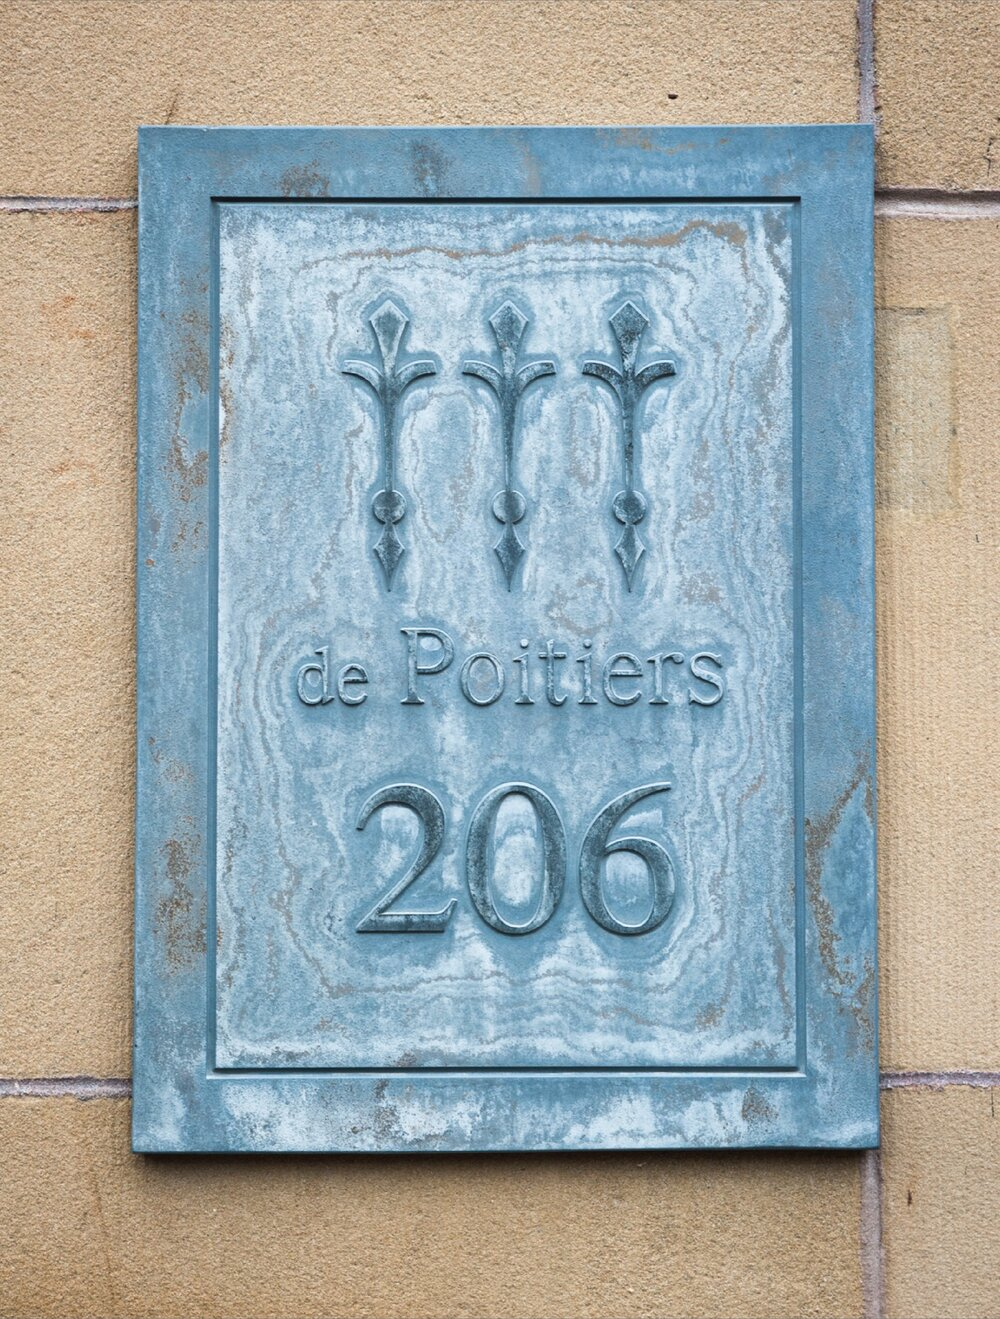 206 de Poitiers